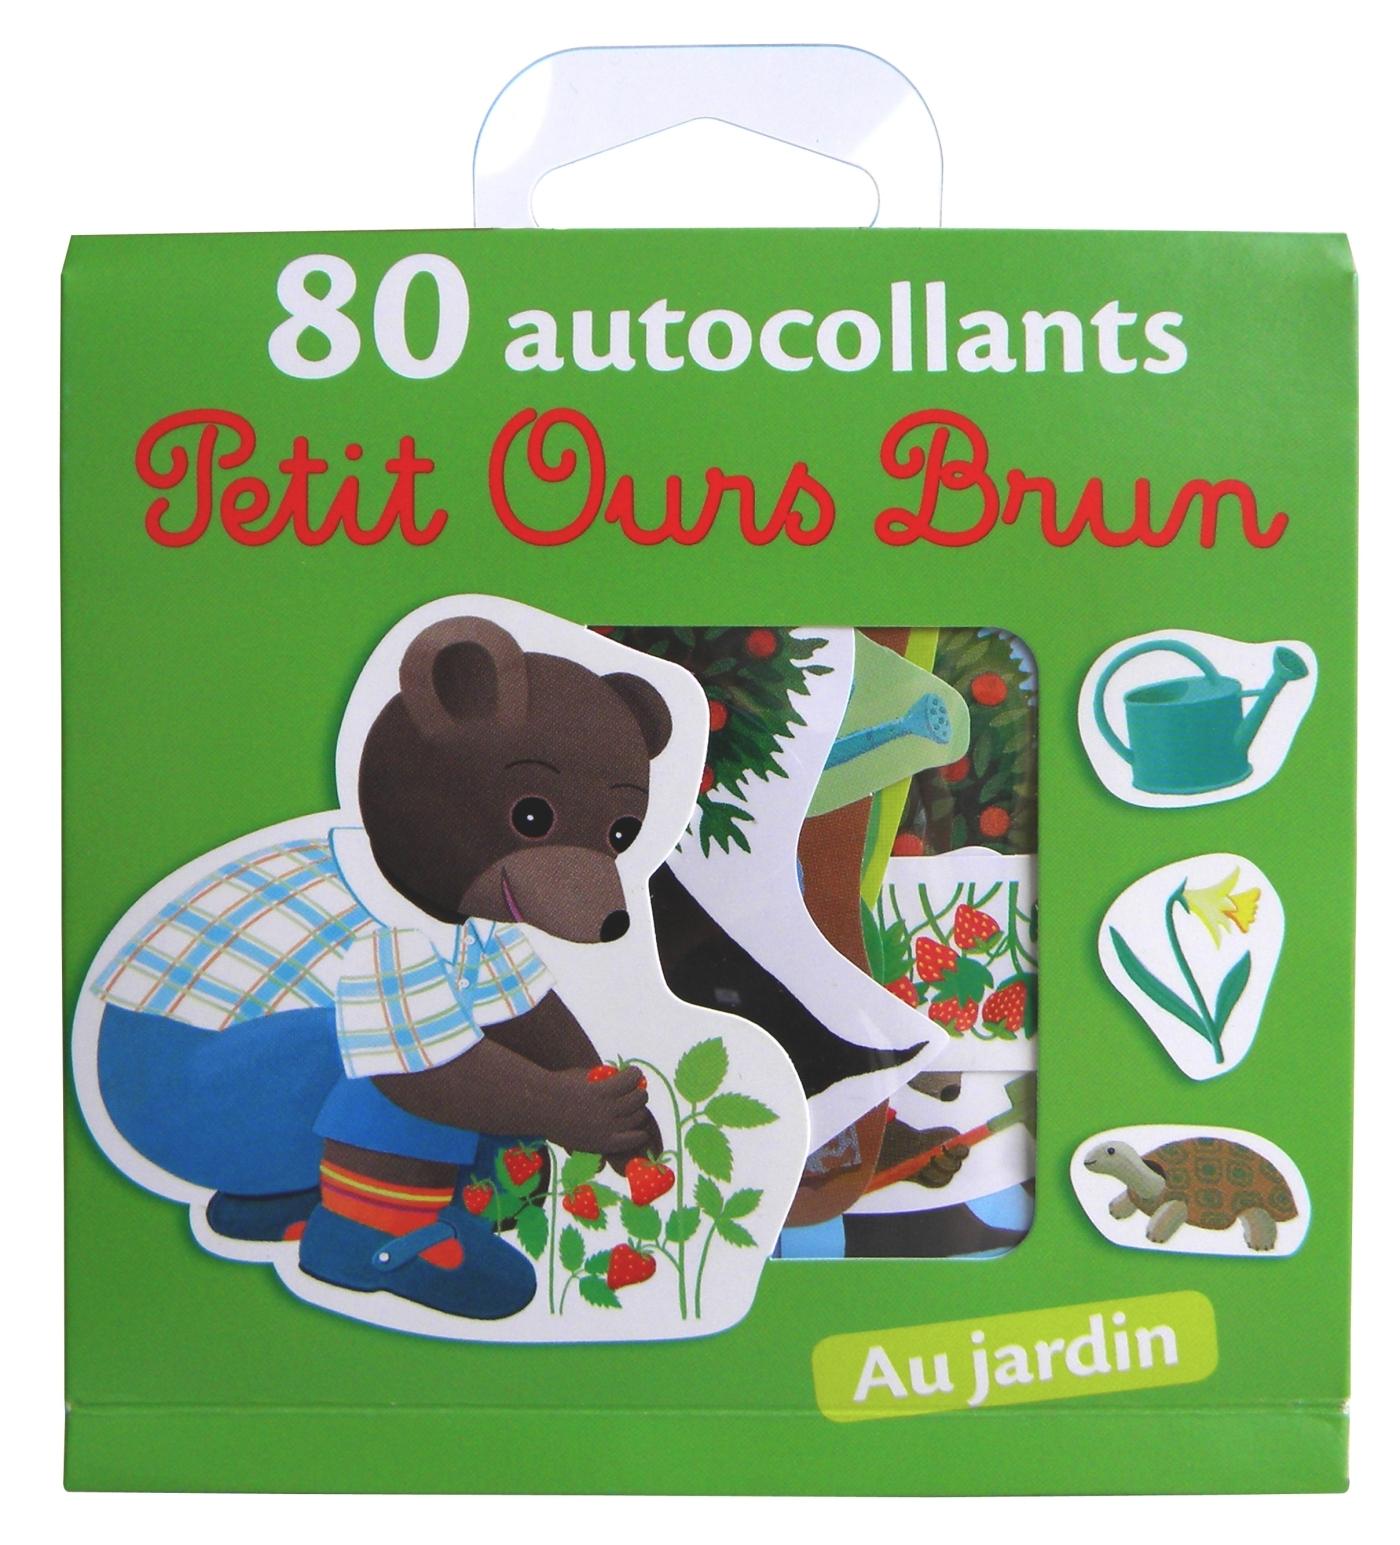 POB AUTOCOLLANTS LE JARDIN